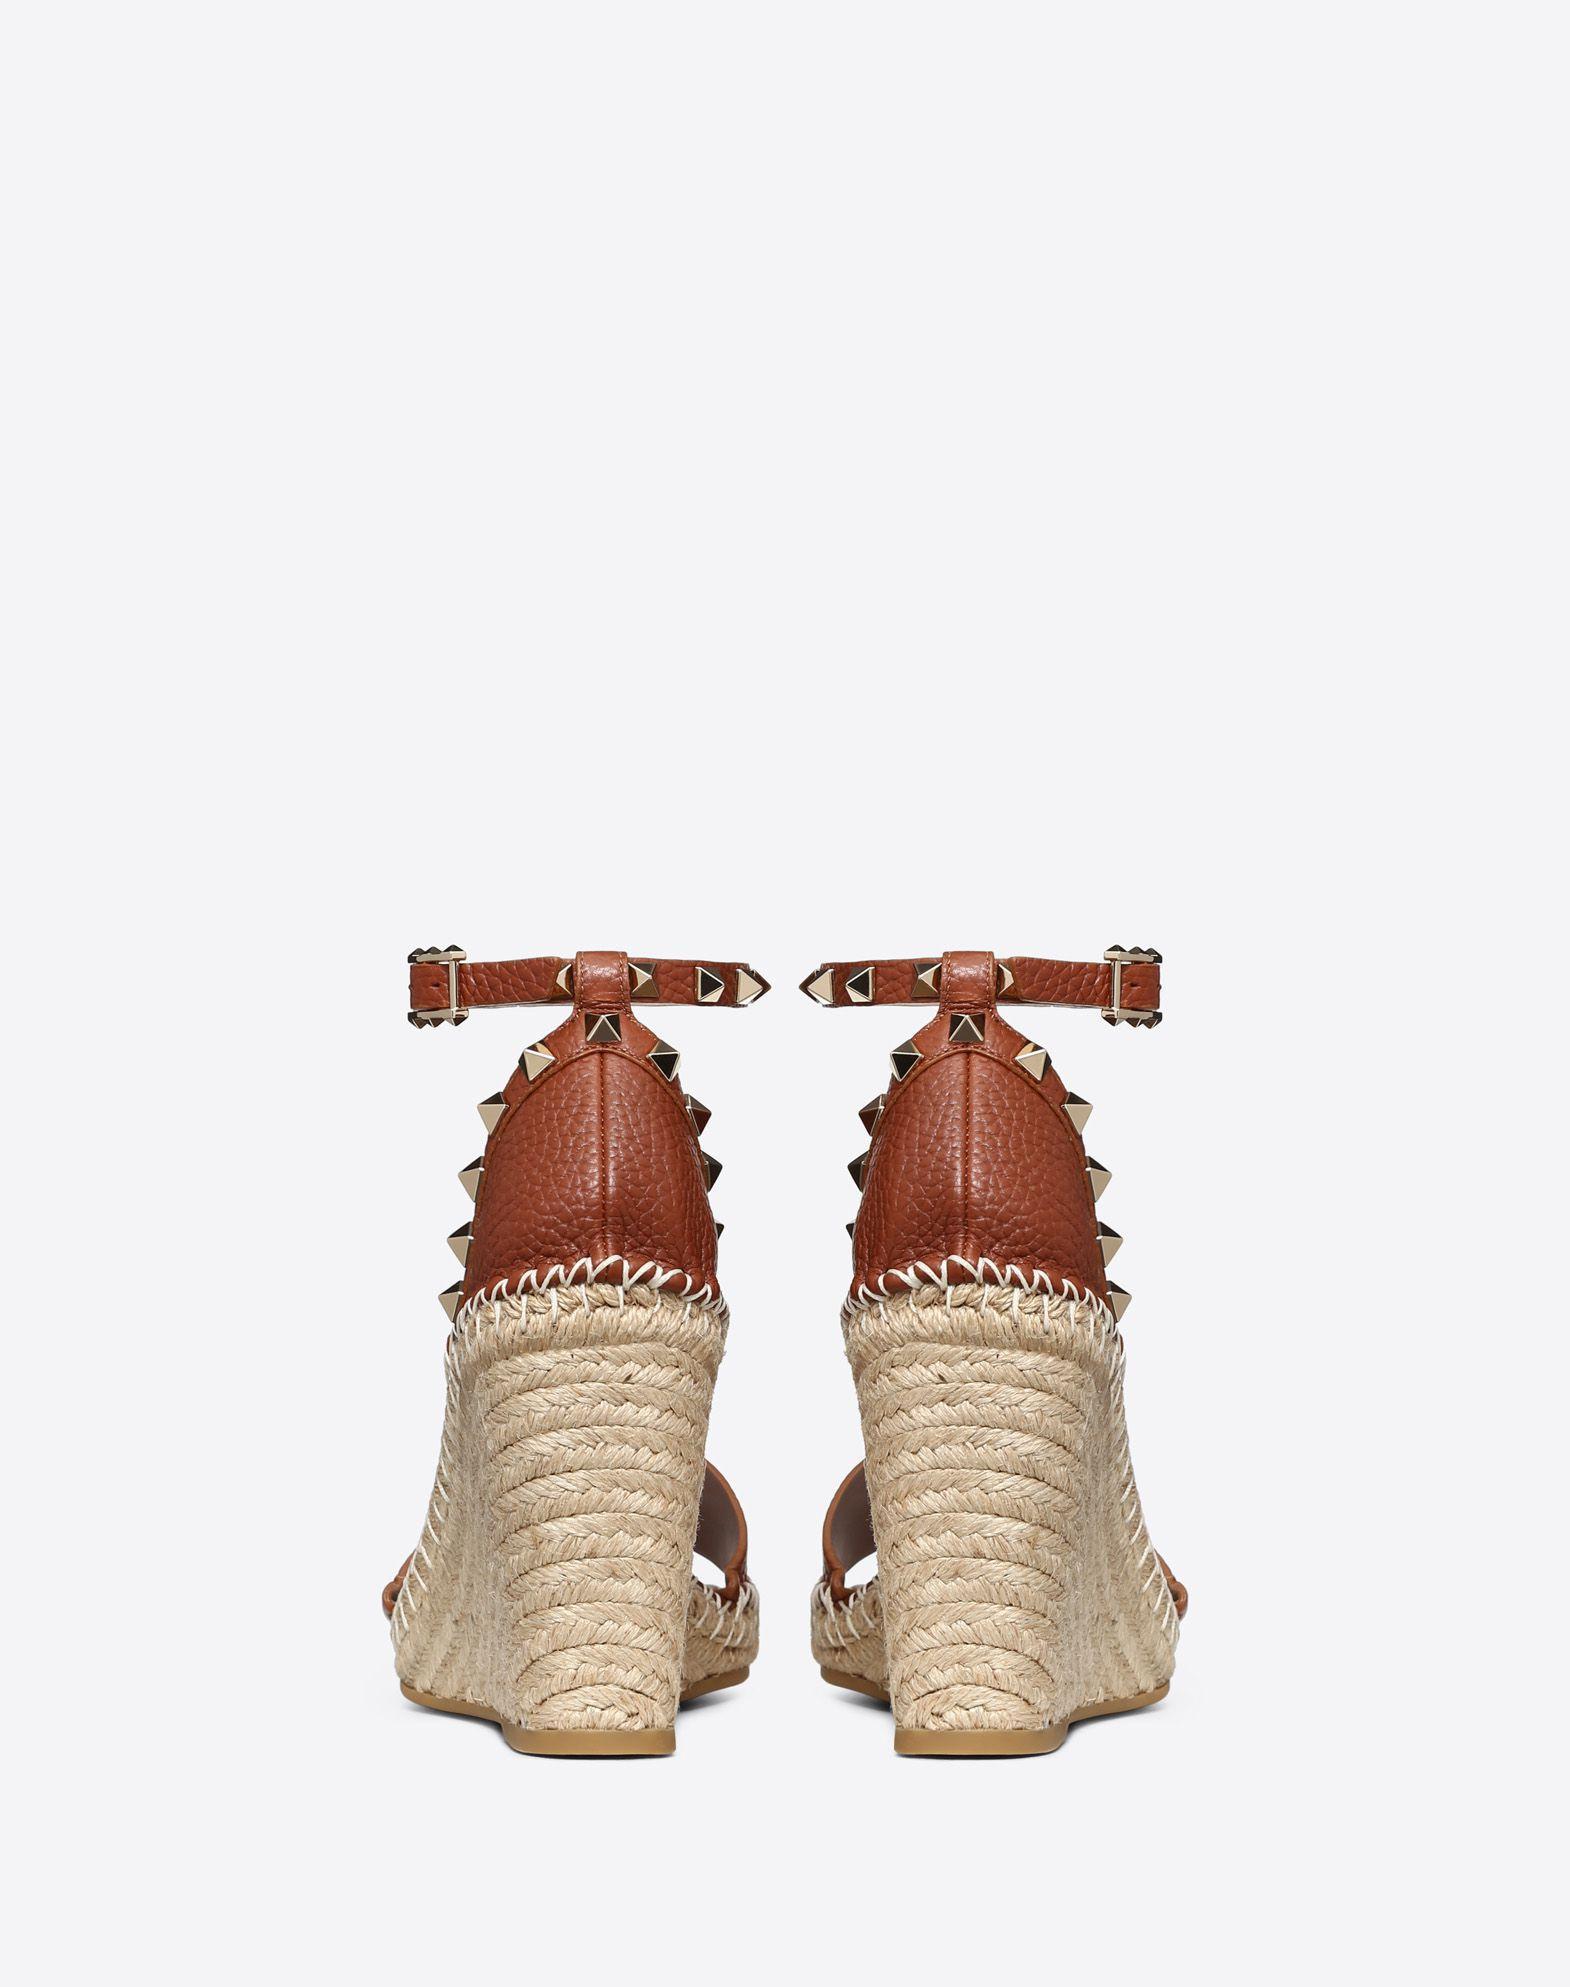 8f8465a57f05c ... Calfskin Leather Rockstud Double Wedge Sandal 95mm - Lyst. View  fullscreen